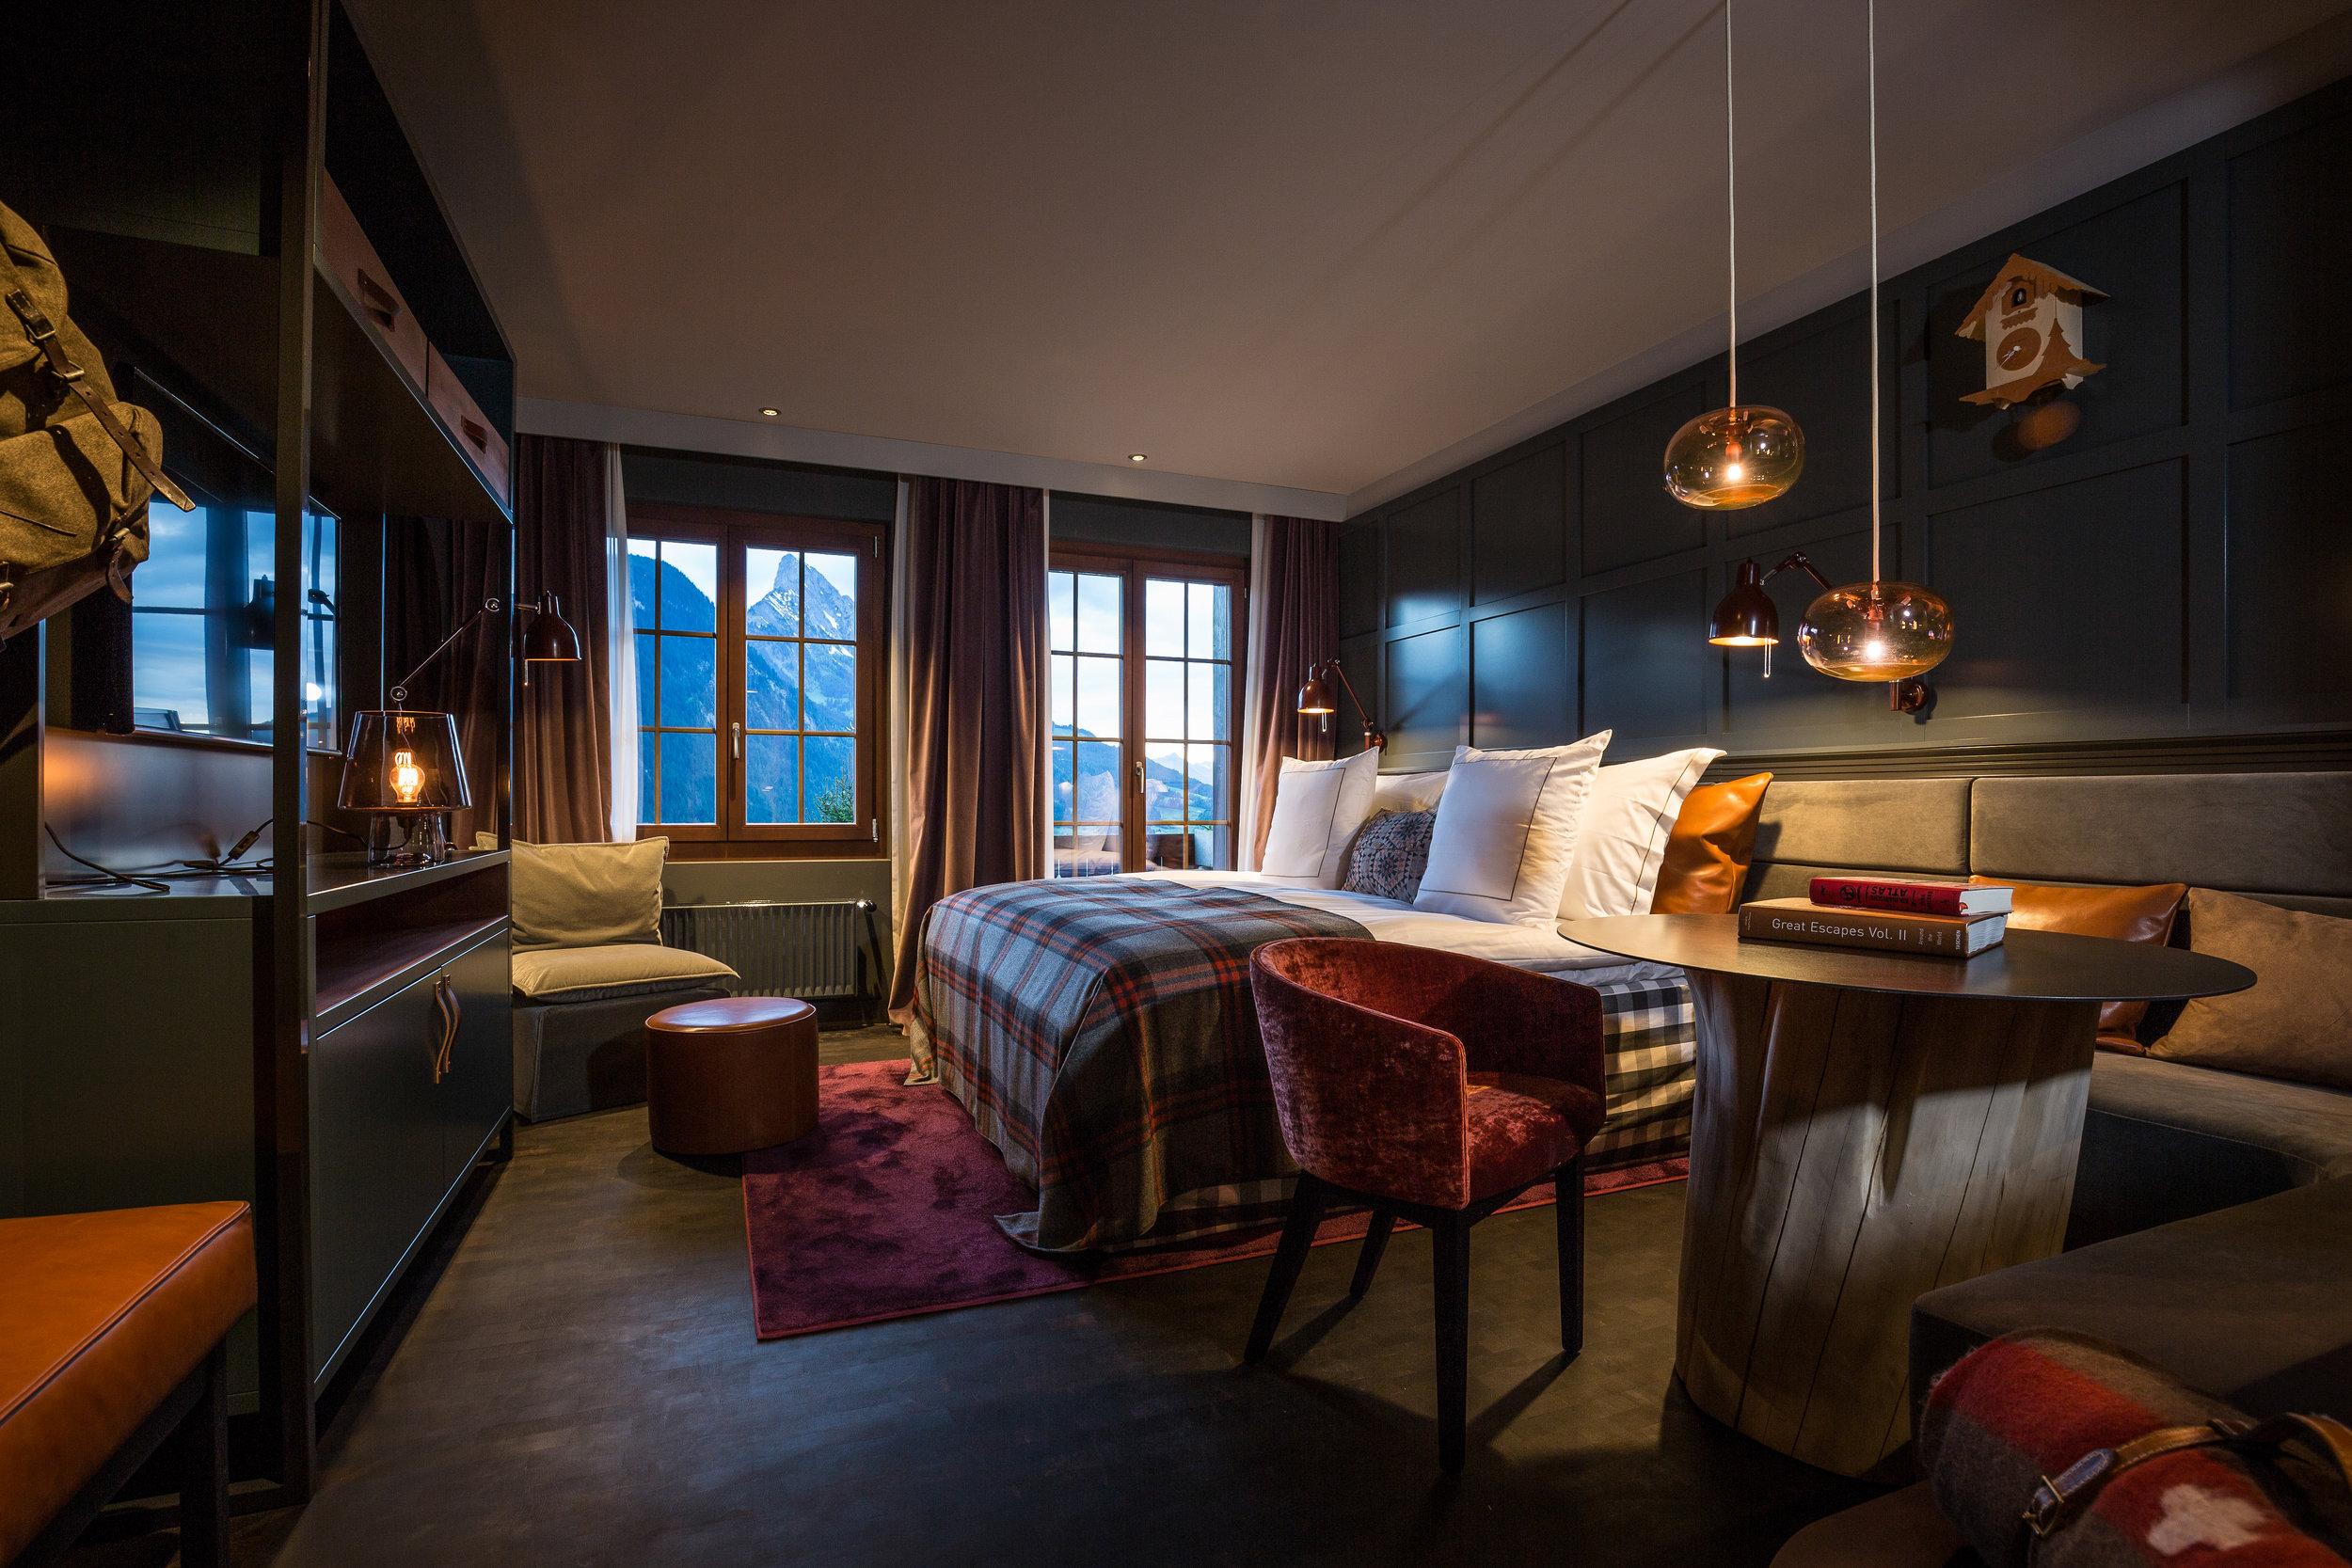 HUUS HOTEL, SWITZERLAND